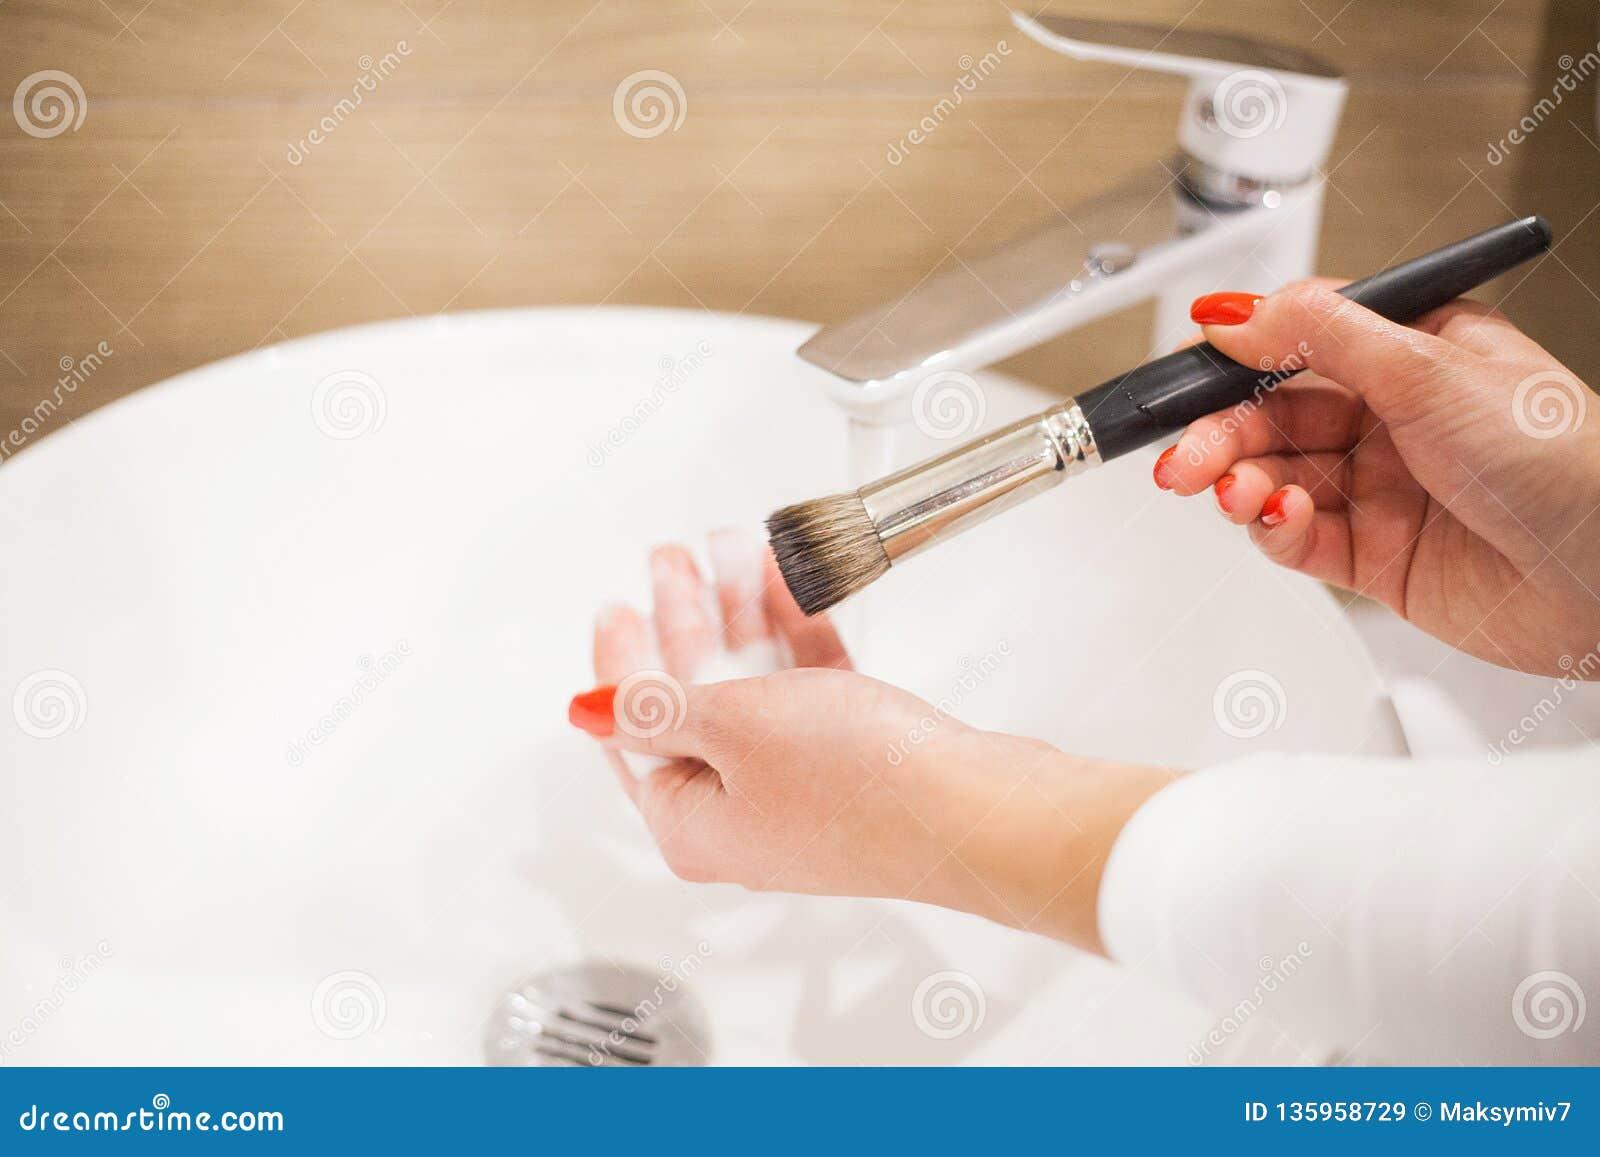 Makr επάνω στη βούρτσα Γυναίκα που πλένει τη βρώμικη βούρτσα makeup με το σαπούνι και τον αφρό στο νεροχύτη